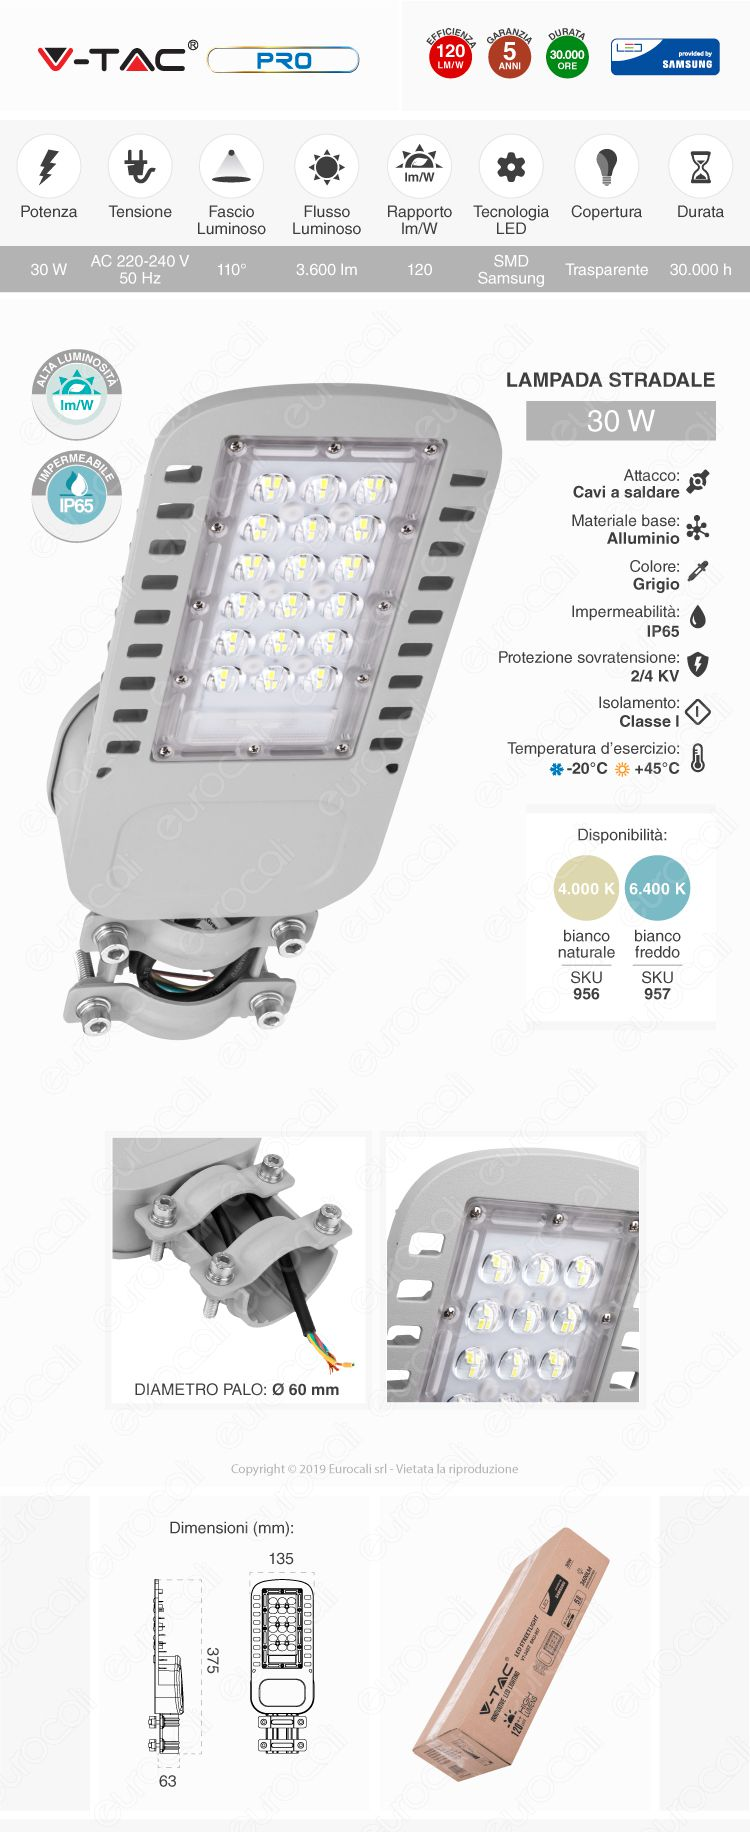 V-Tac PRO VT-34ST Lampada Stradale LED 30W Lampione SMD Chip Samsung